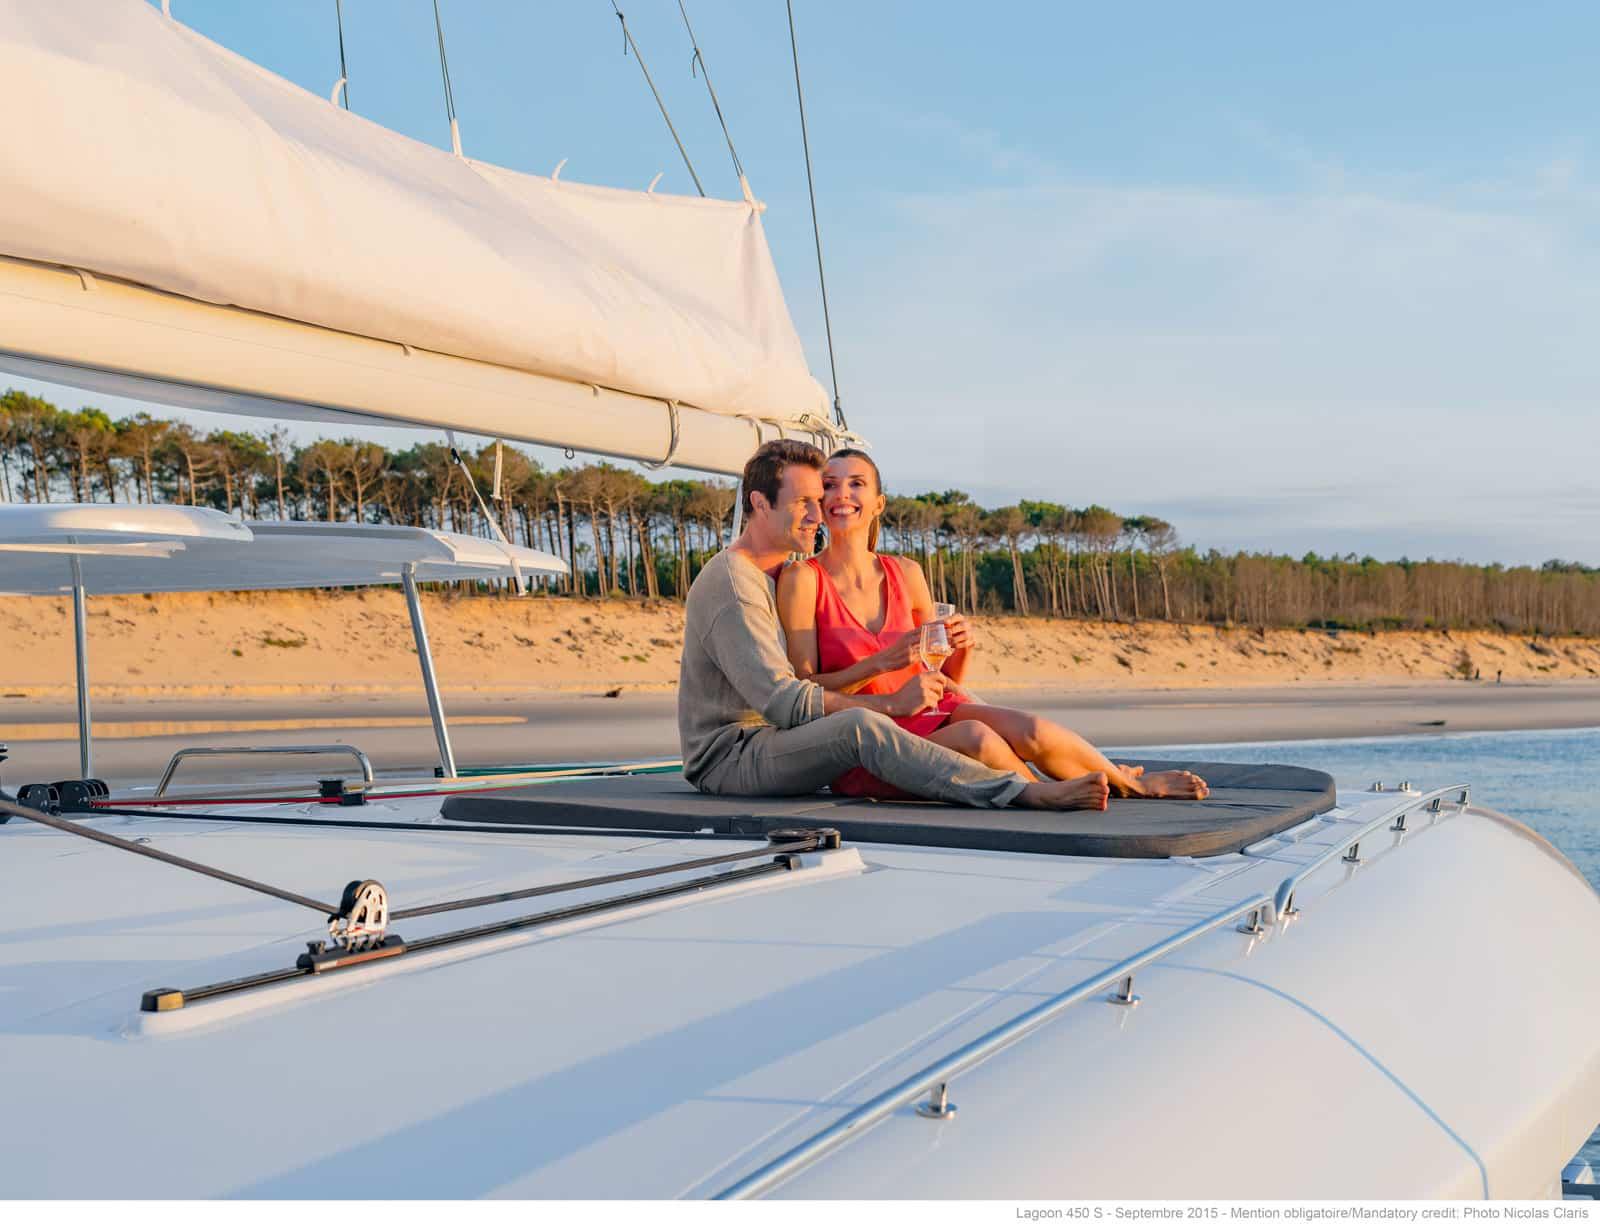 lagoon 450 S-yacht-charter-croatia-sailing-holidays-croatia-booking-yacht-charter-croatia-catamarans-sailboats-motorboats-gulets-luxury-yachts-boat-rental-croatia 2